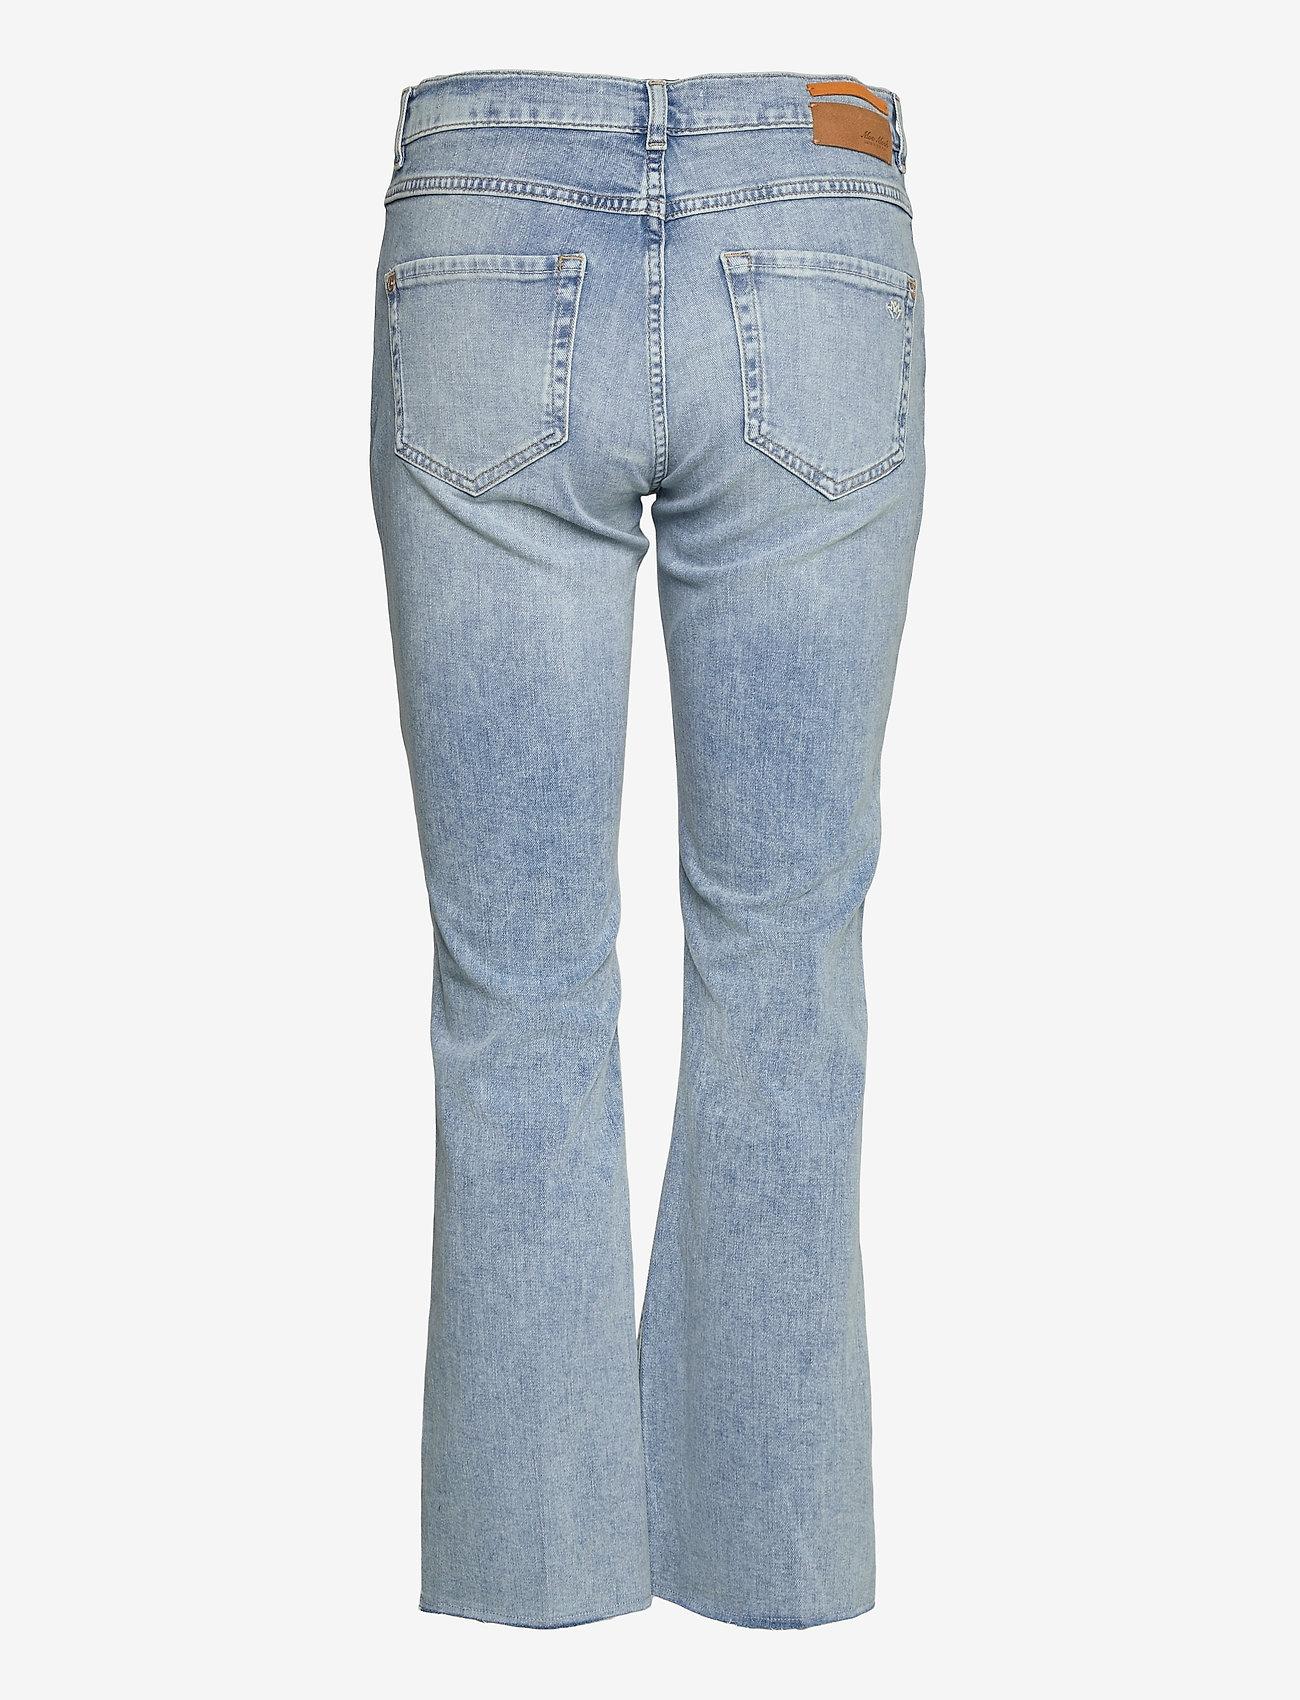 MOS MOSH - Simone Swift Jeans - schlaghosen - light blue - 1